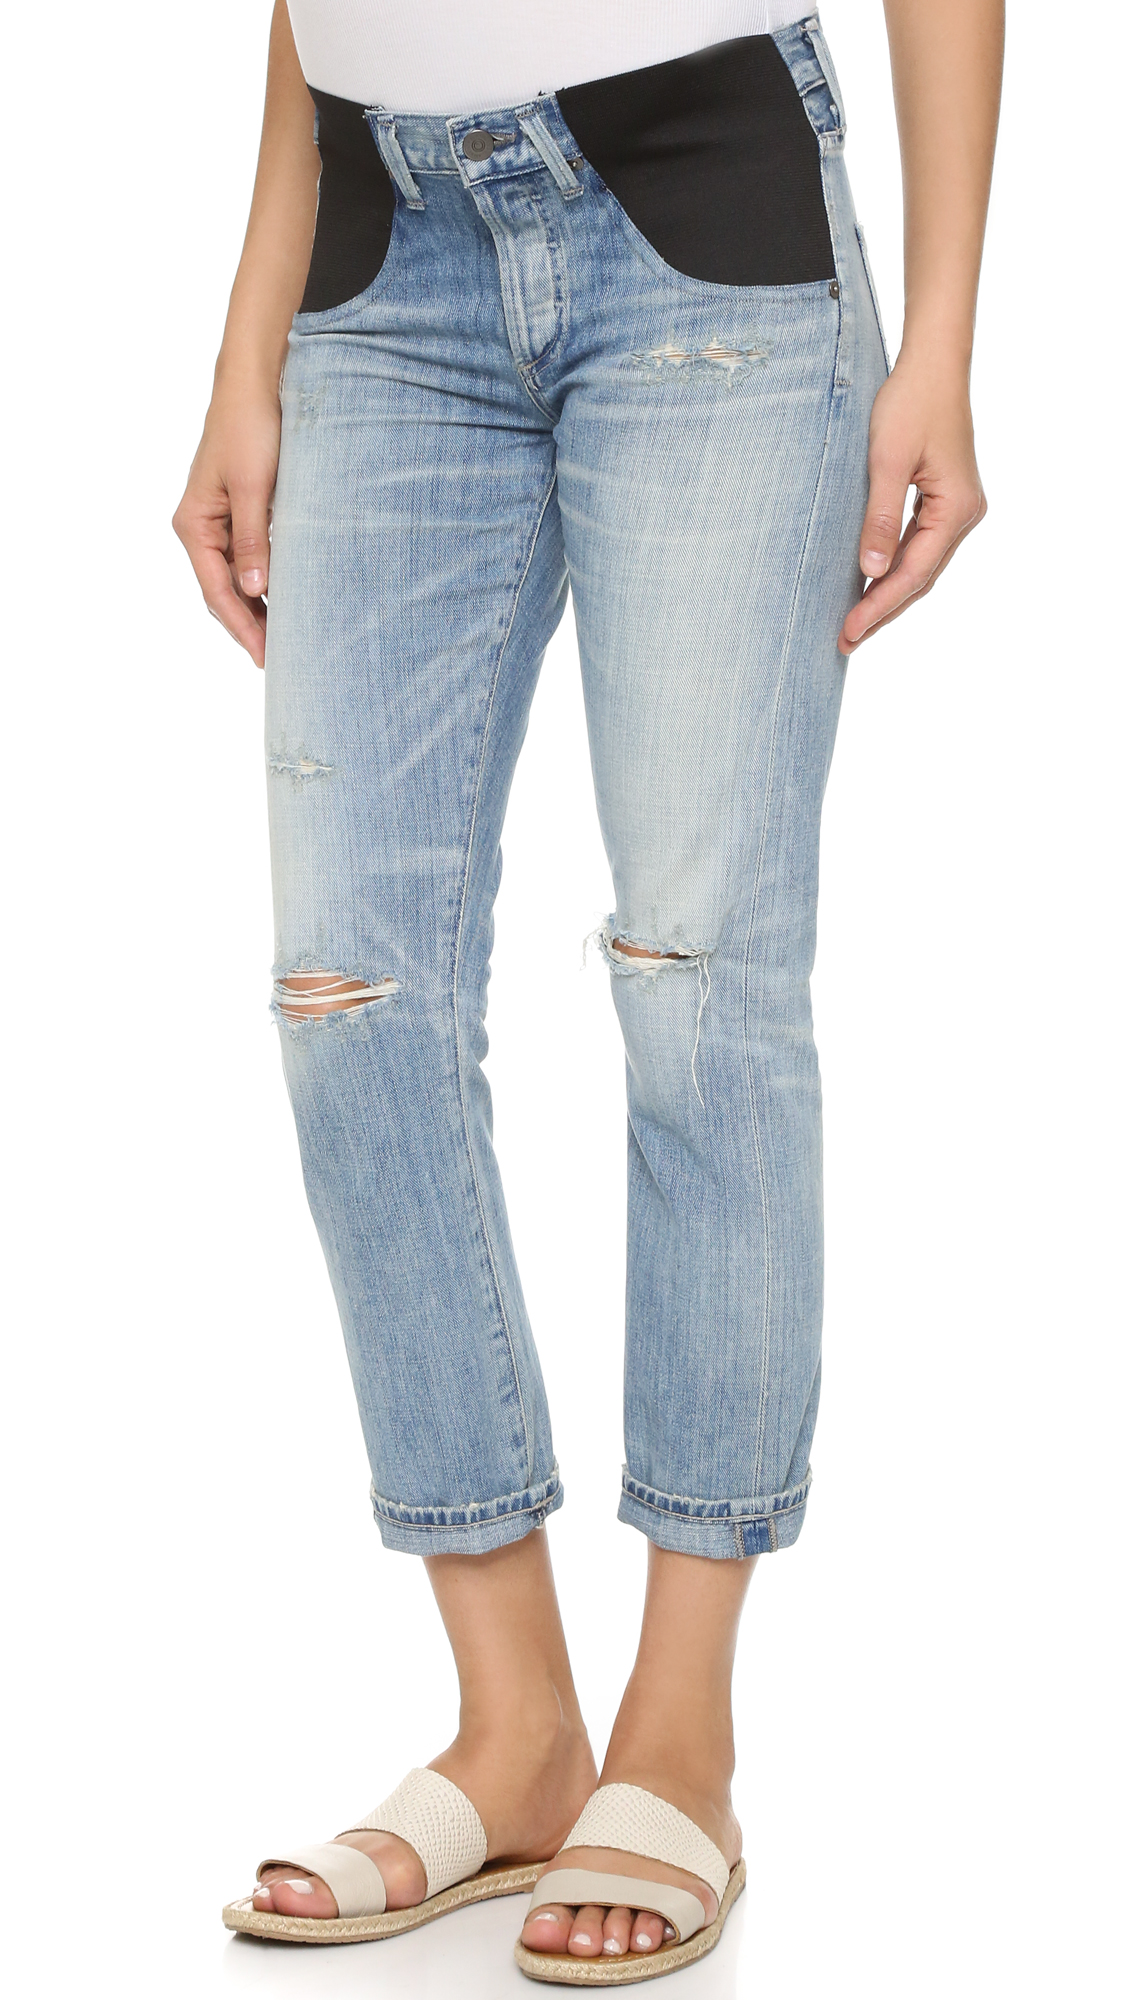 Citizens Of Humanity Emerson Maternity Slim Boyfriend Jeans - Distressed Sebring